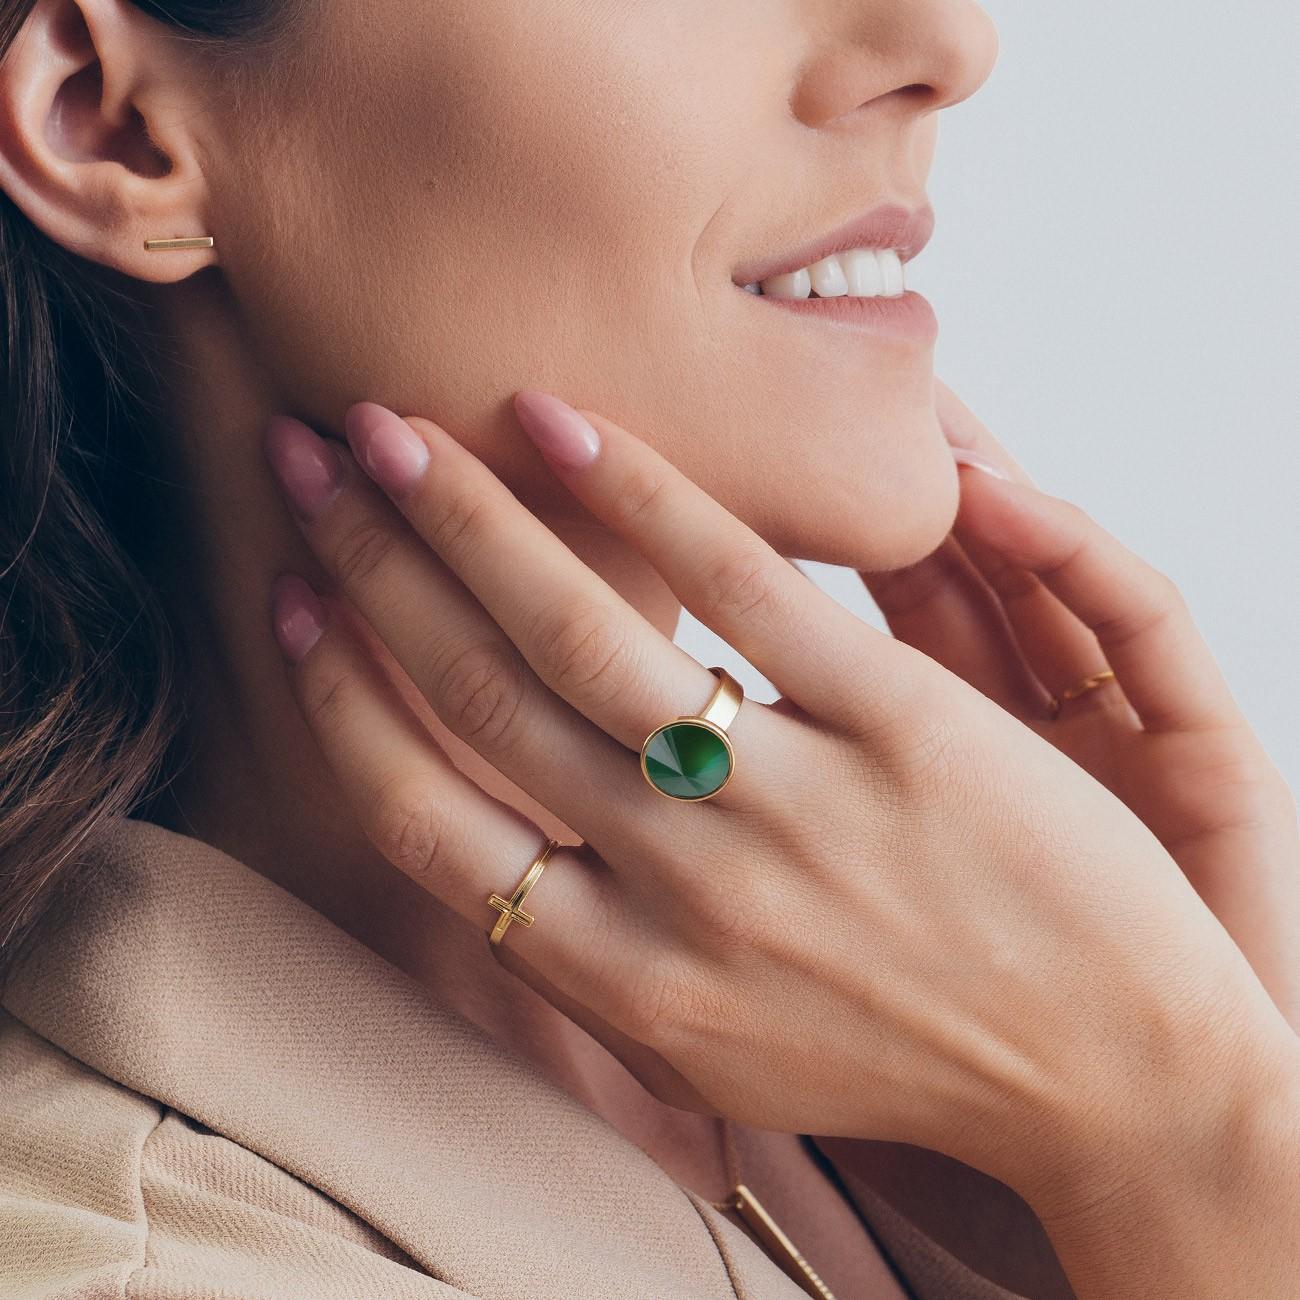 Srebrny pierścionek z naturalnym kamieniem - jadeit zielony ciemny, srebro 925